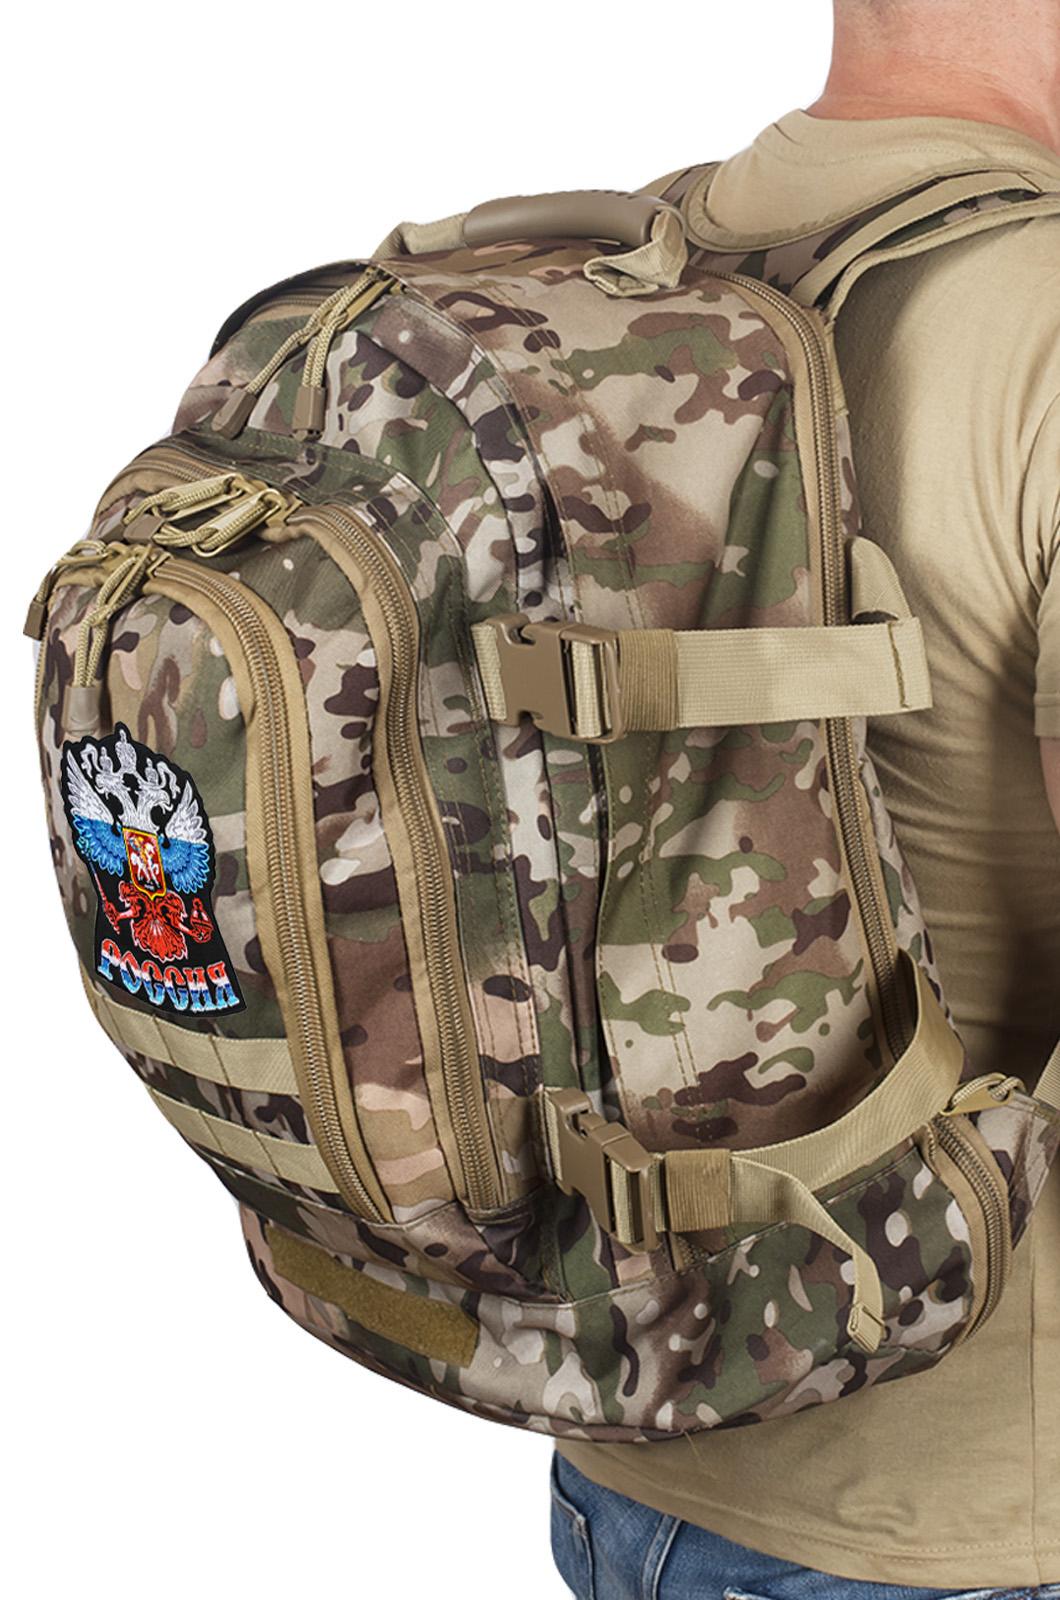 "Тактический рюкзак разведчика 3-Day Expandable Backpack 08002B Multicam с эмблемой ""Россия"""